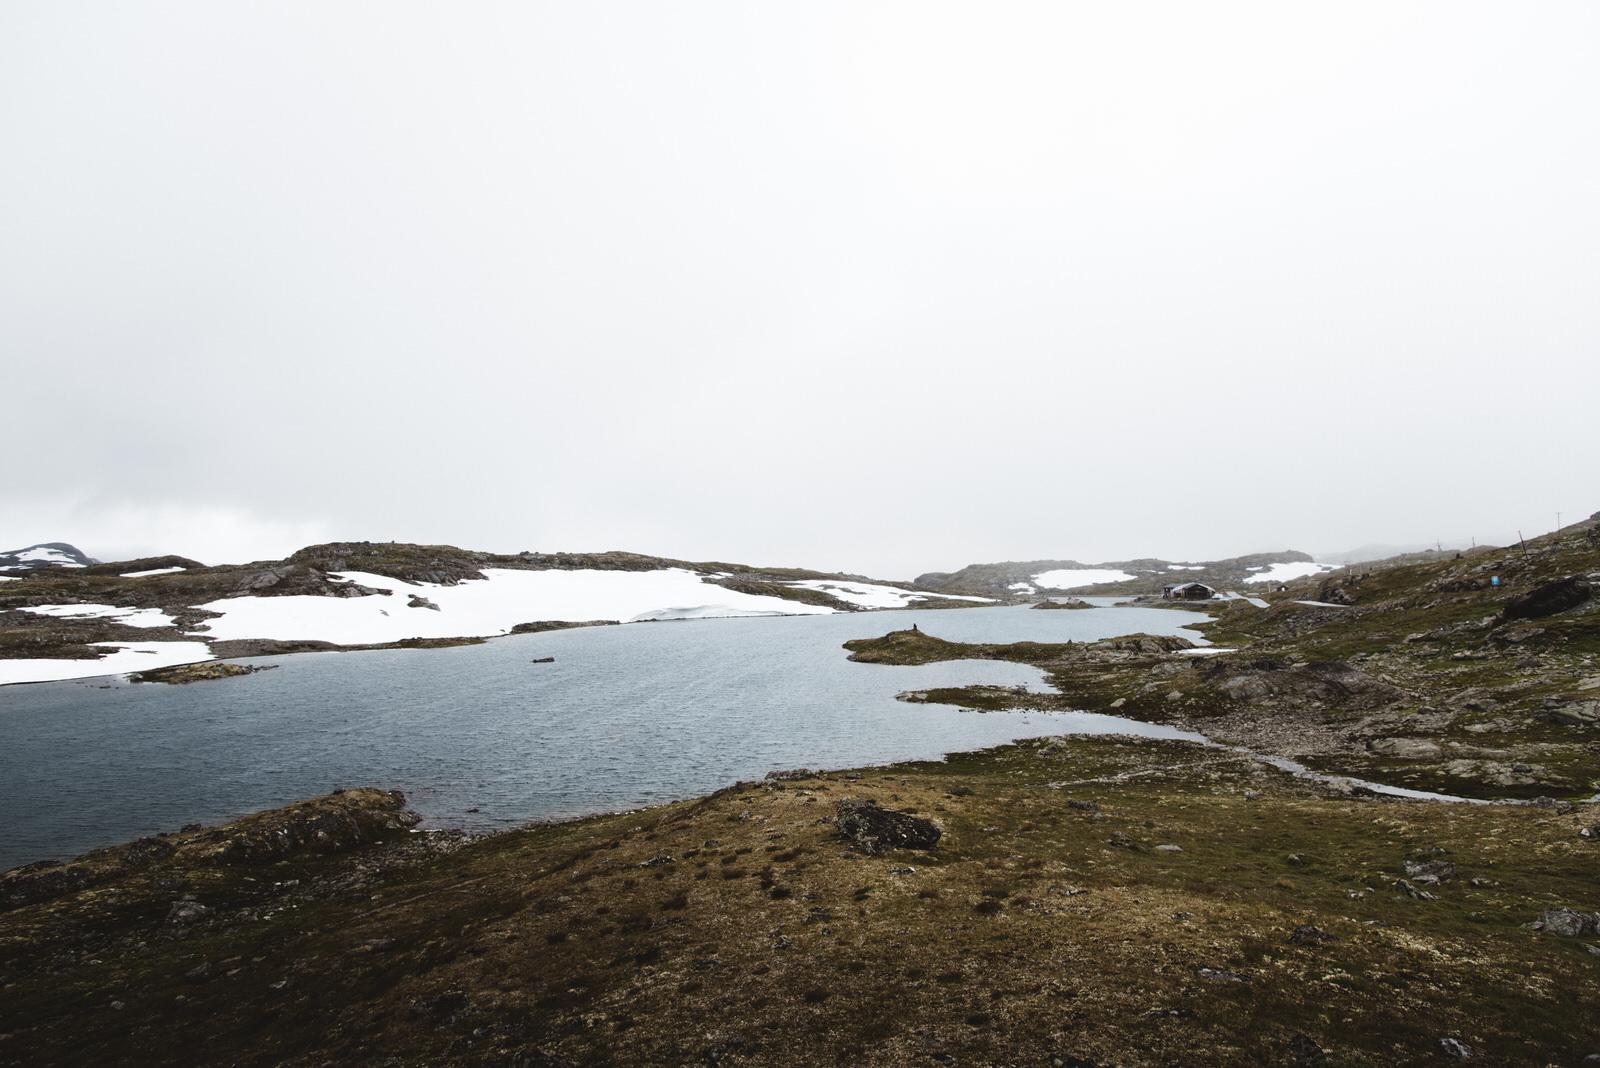 norway 2016 part 6 jotunheimen sognefjellet valdresflya